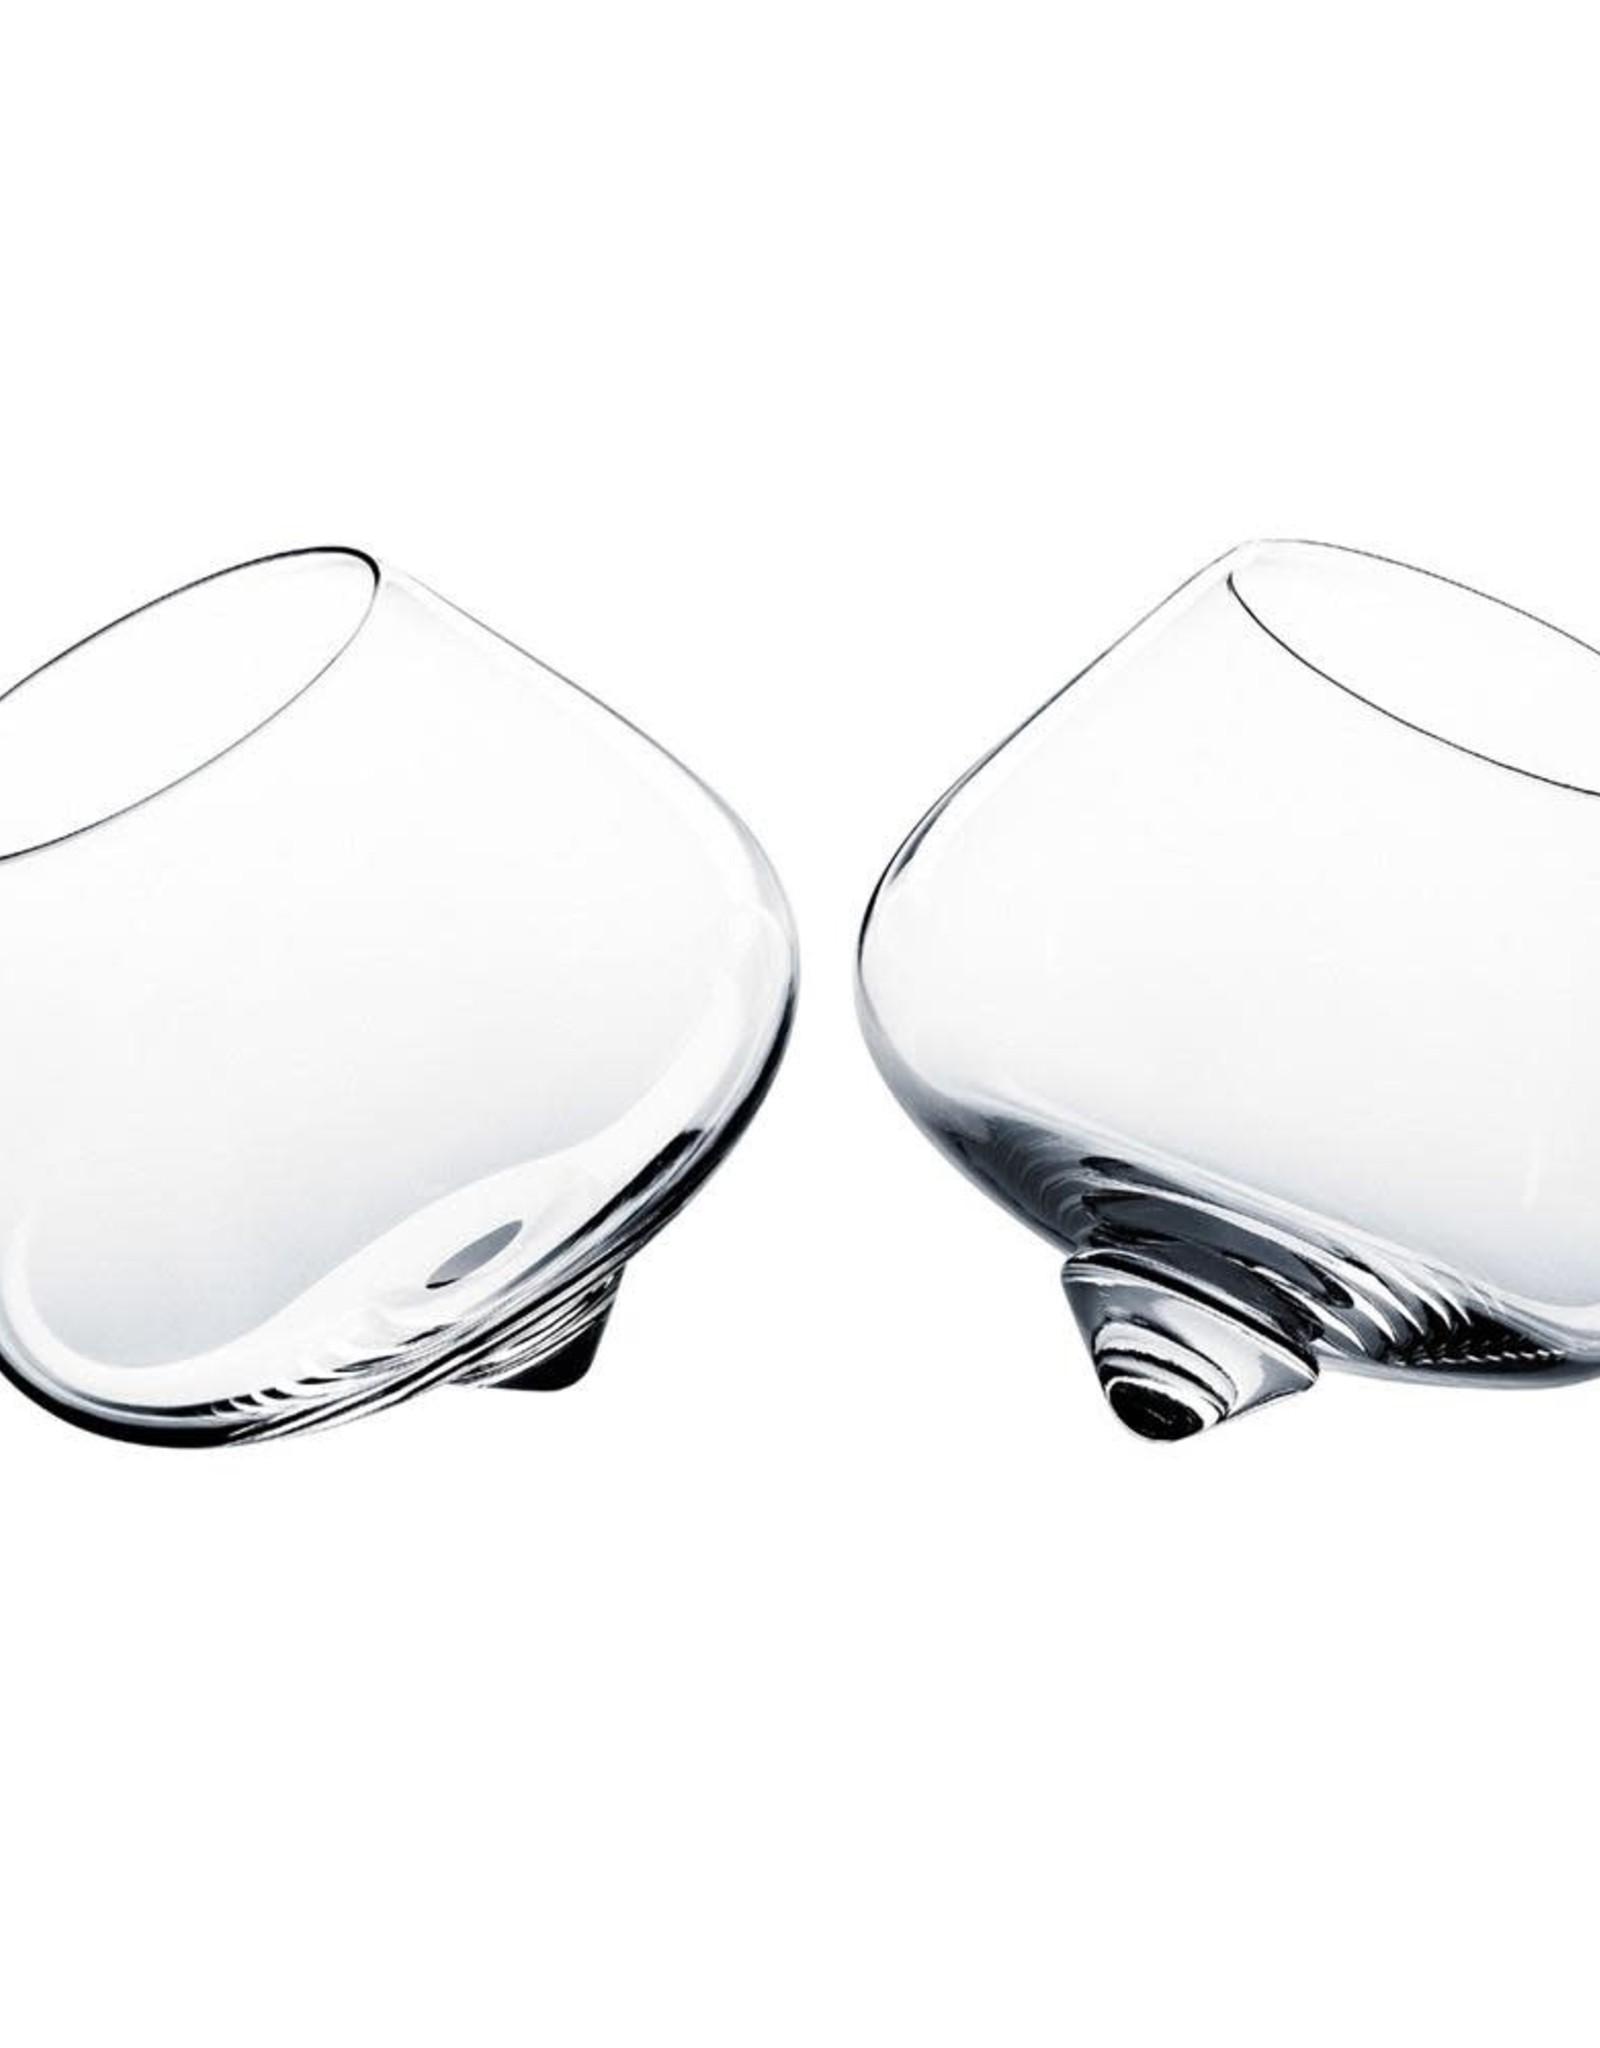 Normann Copenhagen Normann Liqueur Glass - 2 pcs, 15 cl Glass